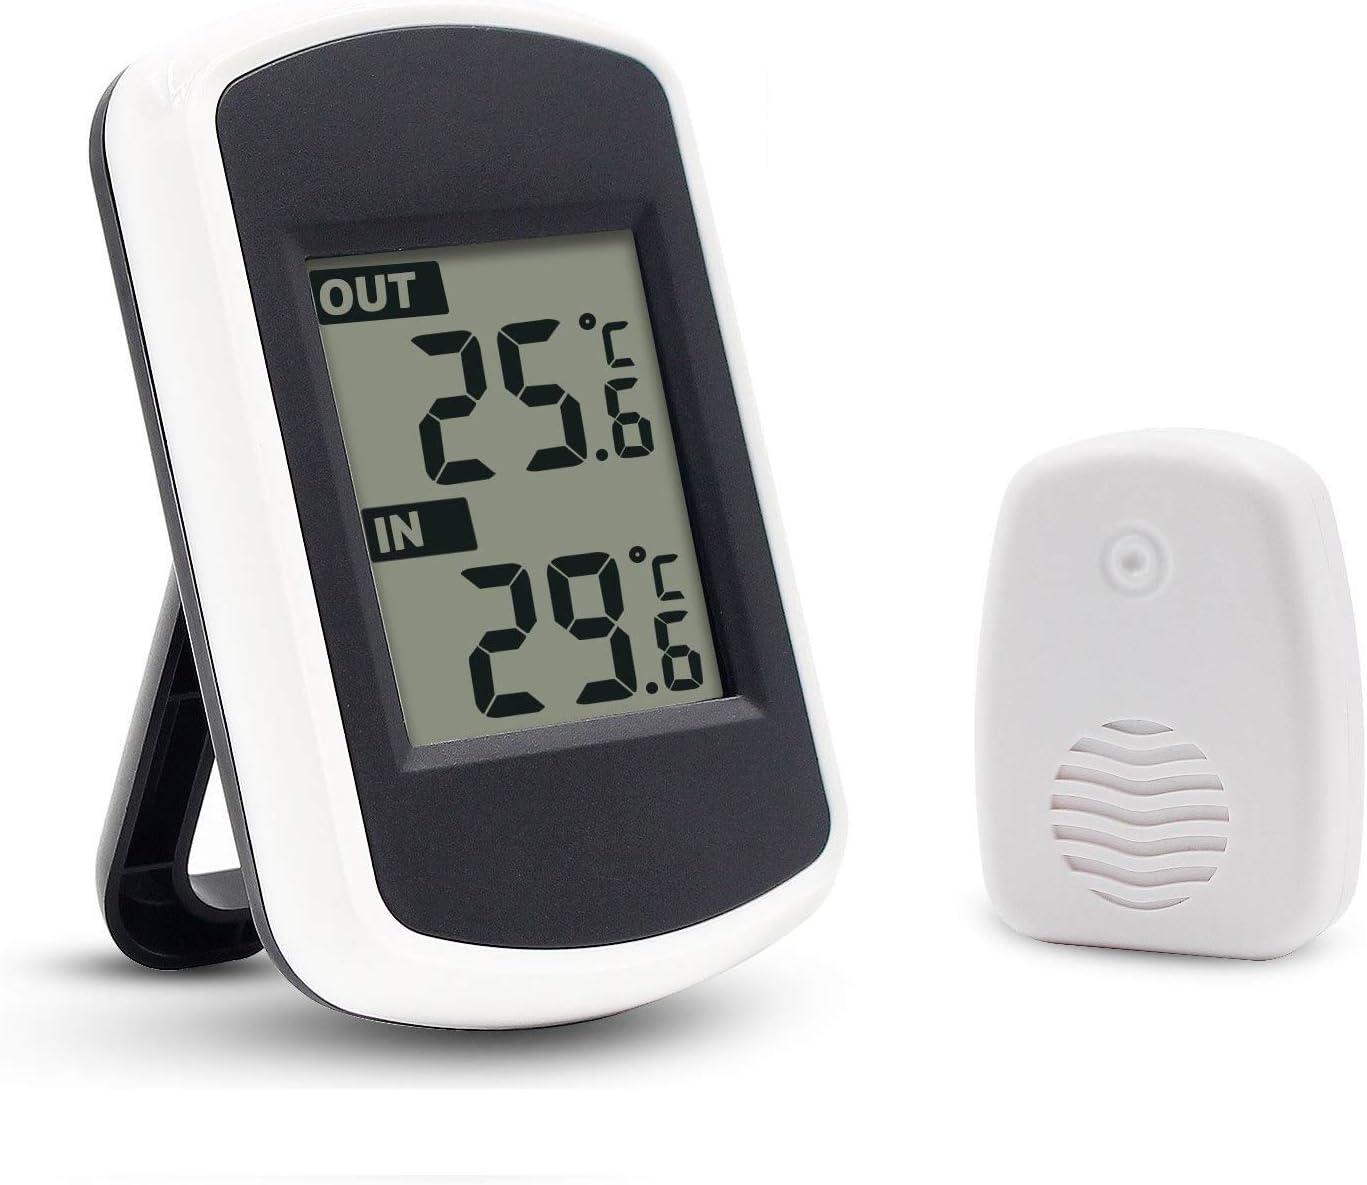 Ulable - Termómetro para interiores y exteriores con pantalla LCD digital (inalámbrico)